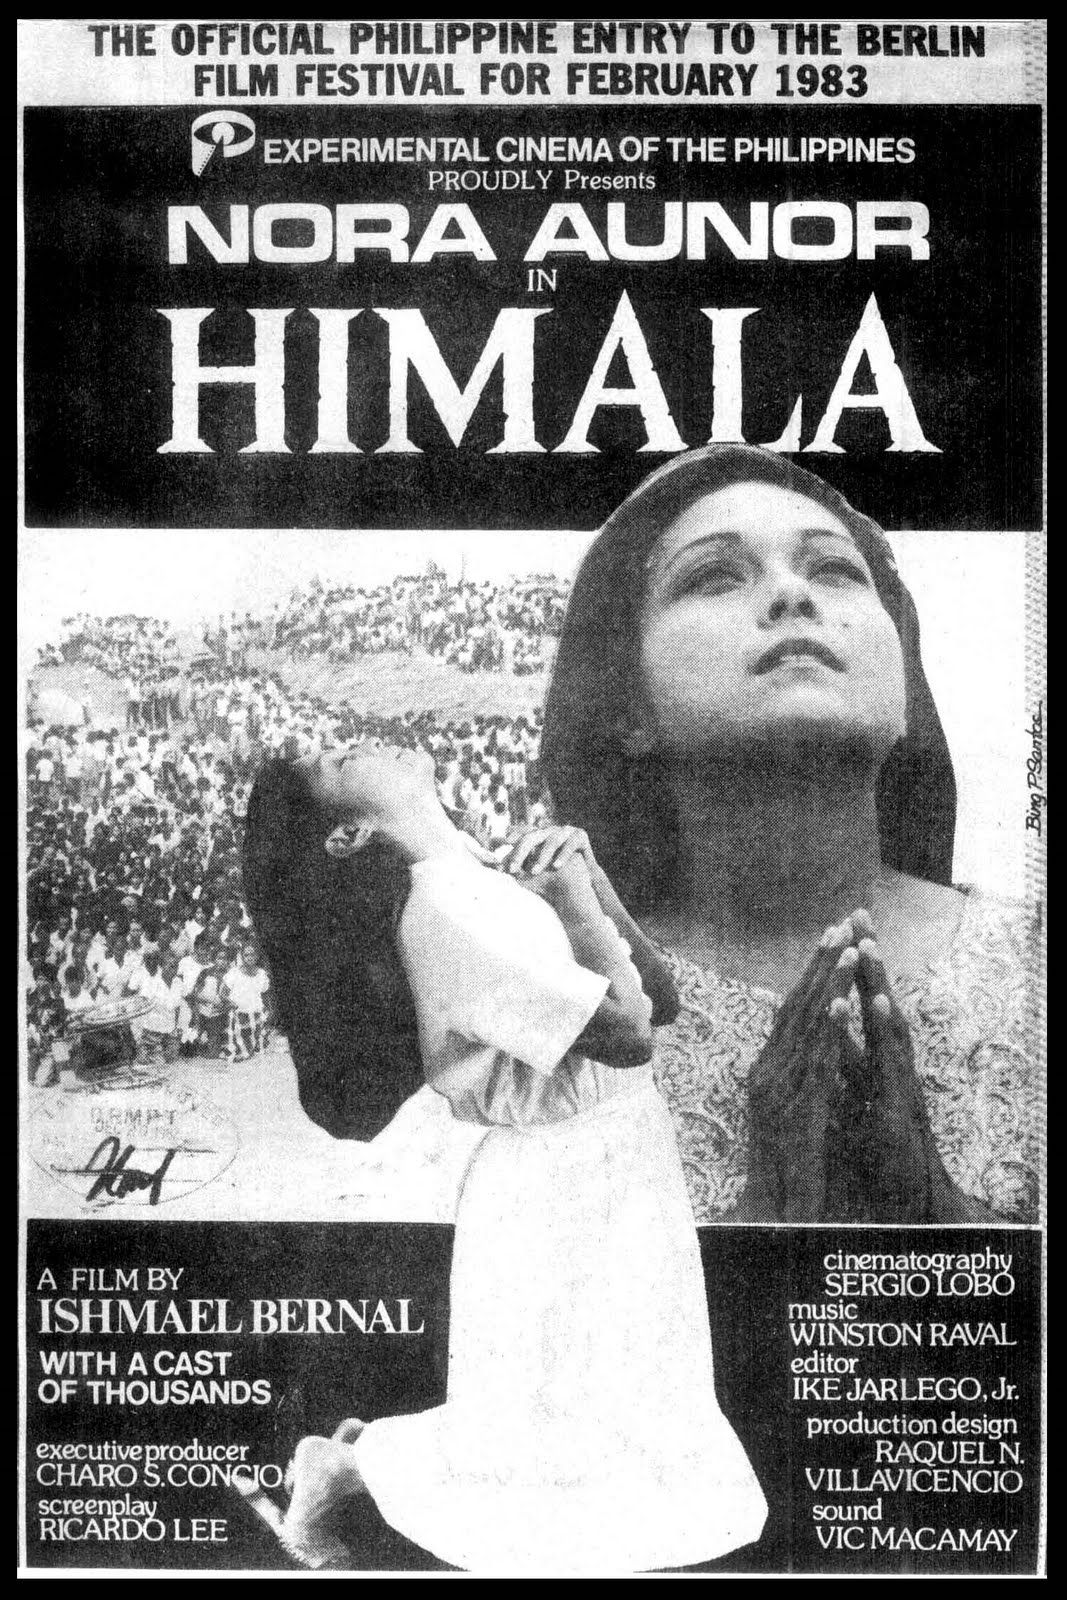 himala 1982 by ishmael bernal a filipino classic that